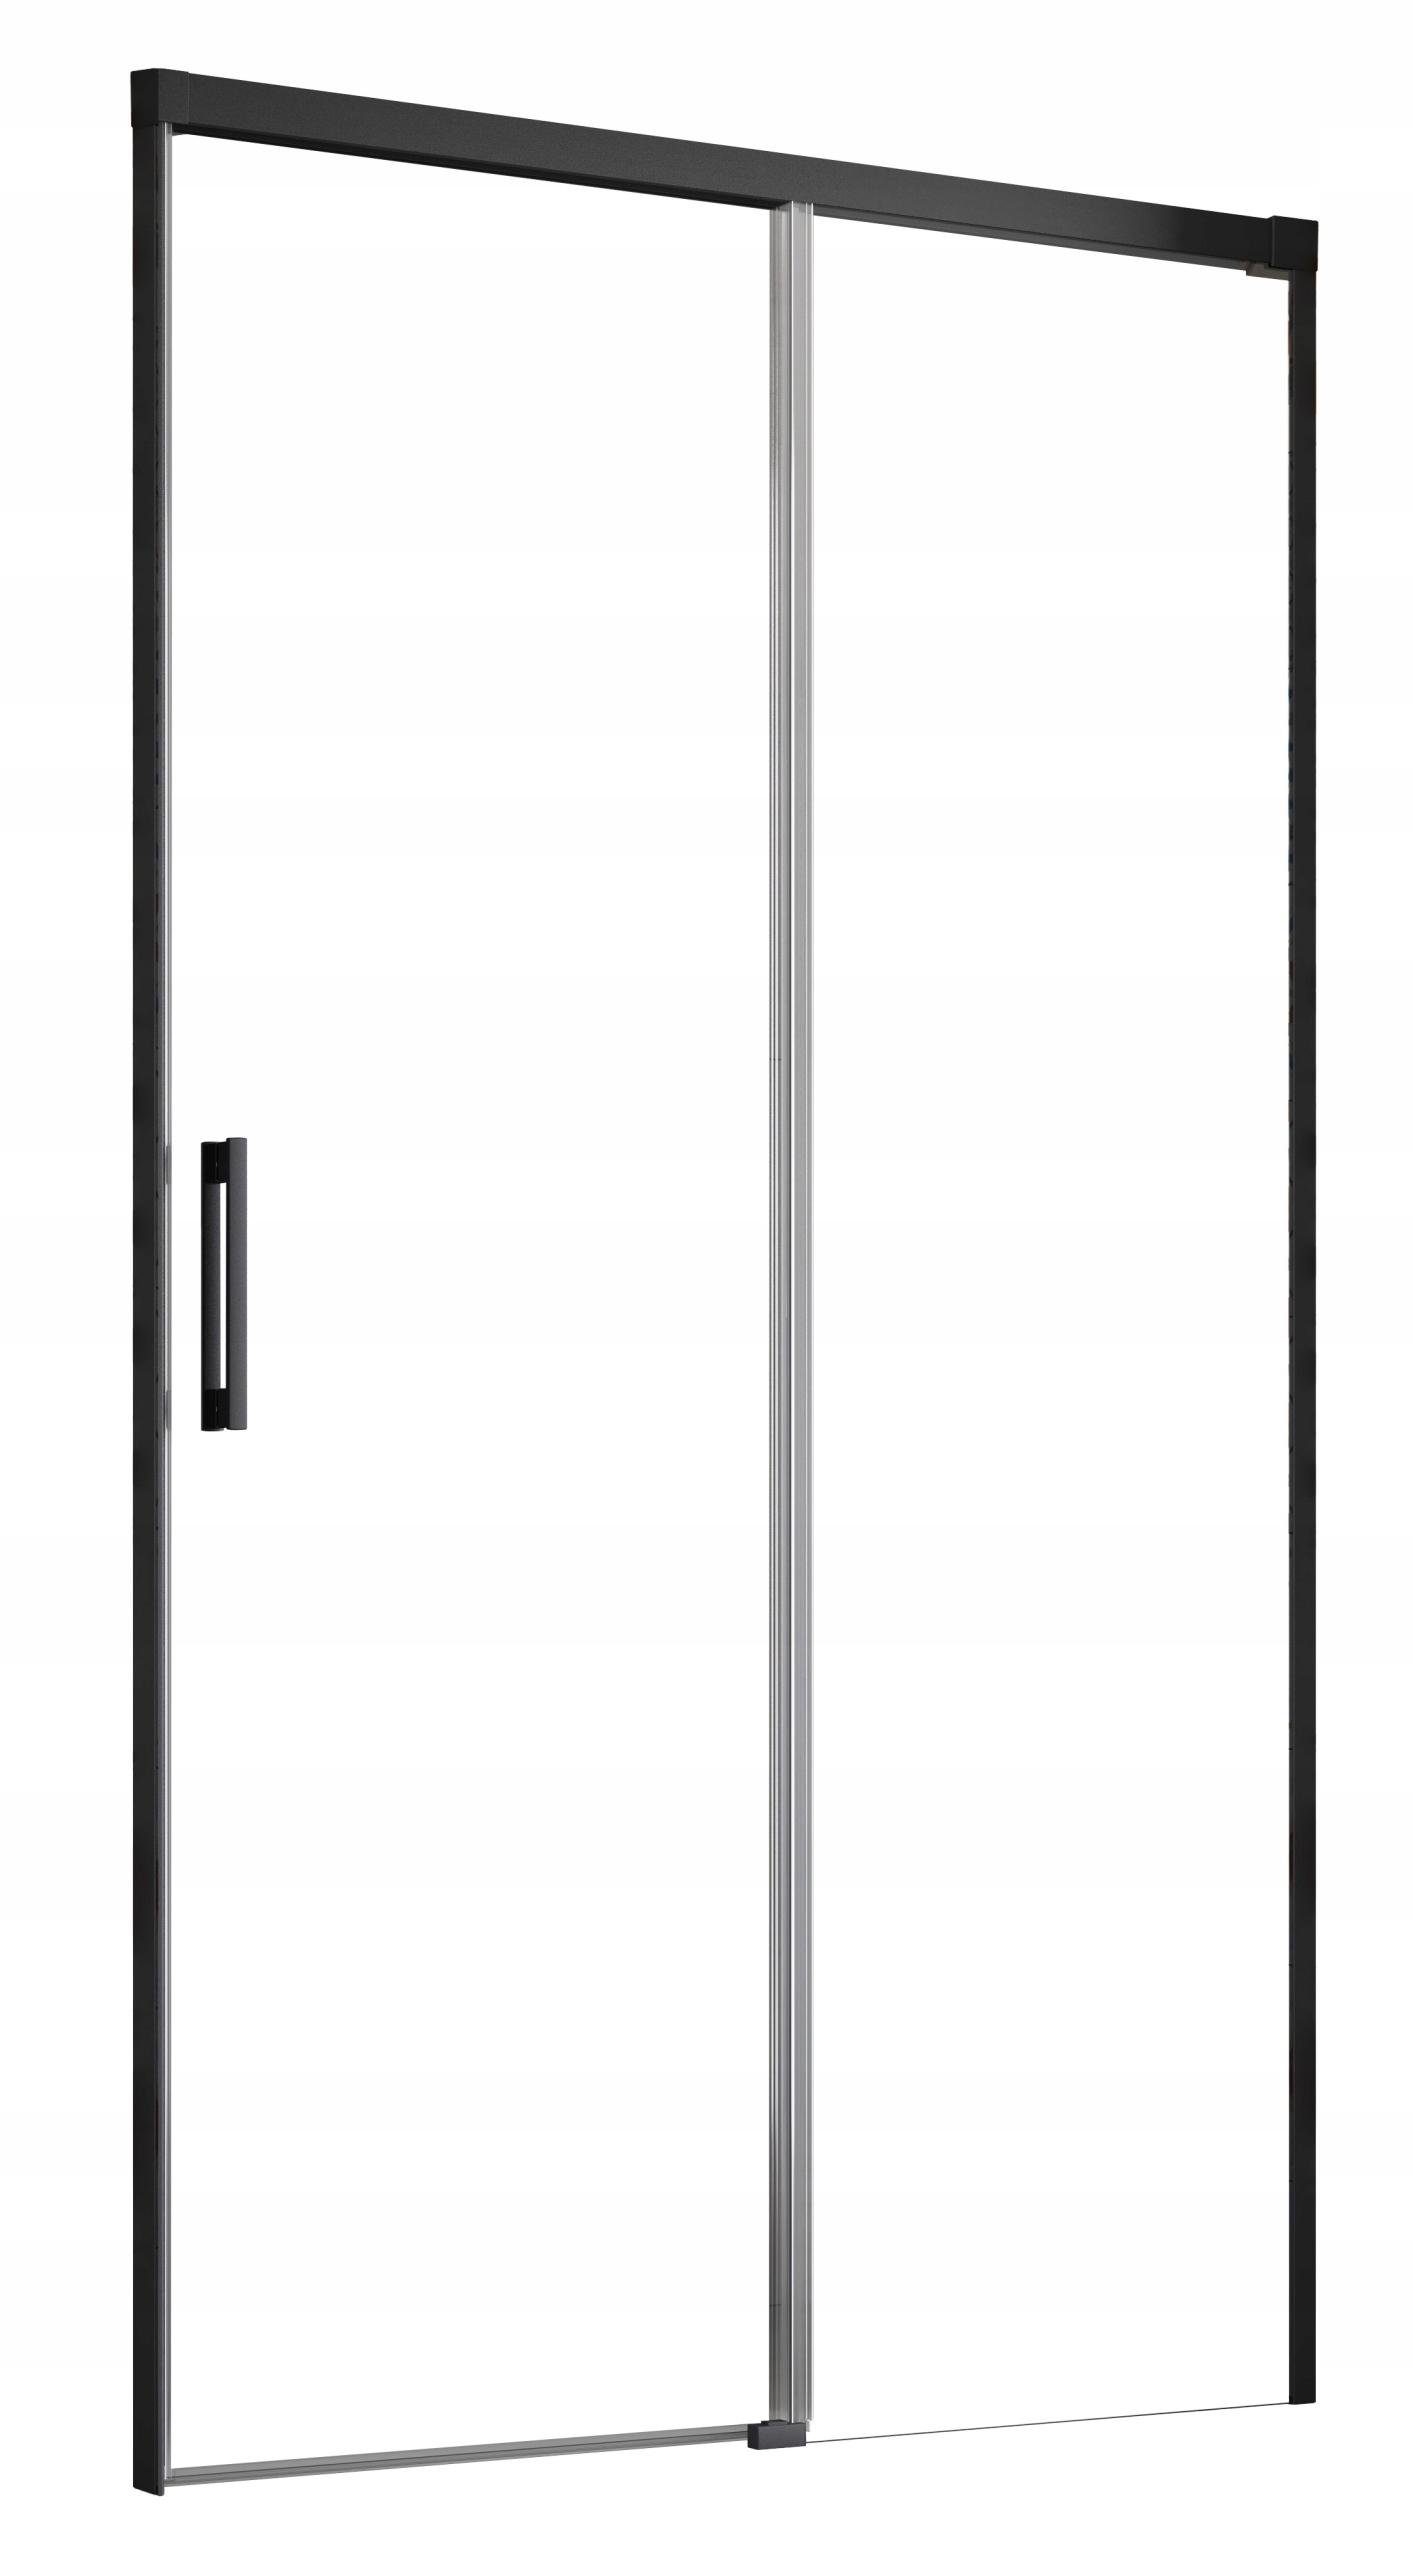 Idea Black sprchové dvere DWJ 110x200,5 RADAWAY